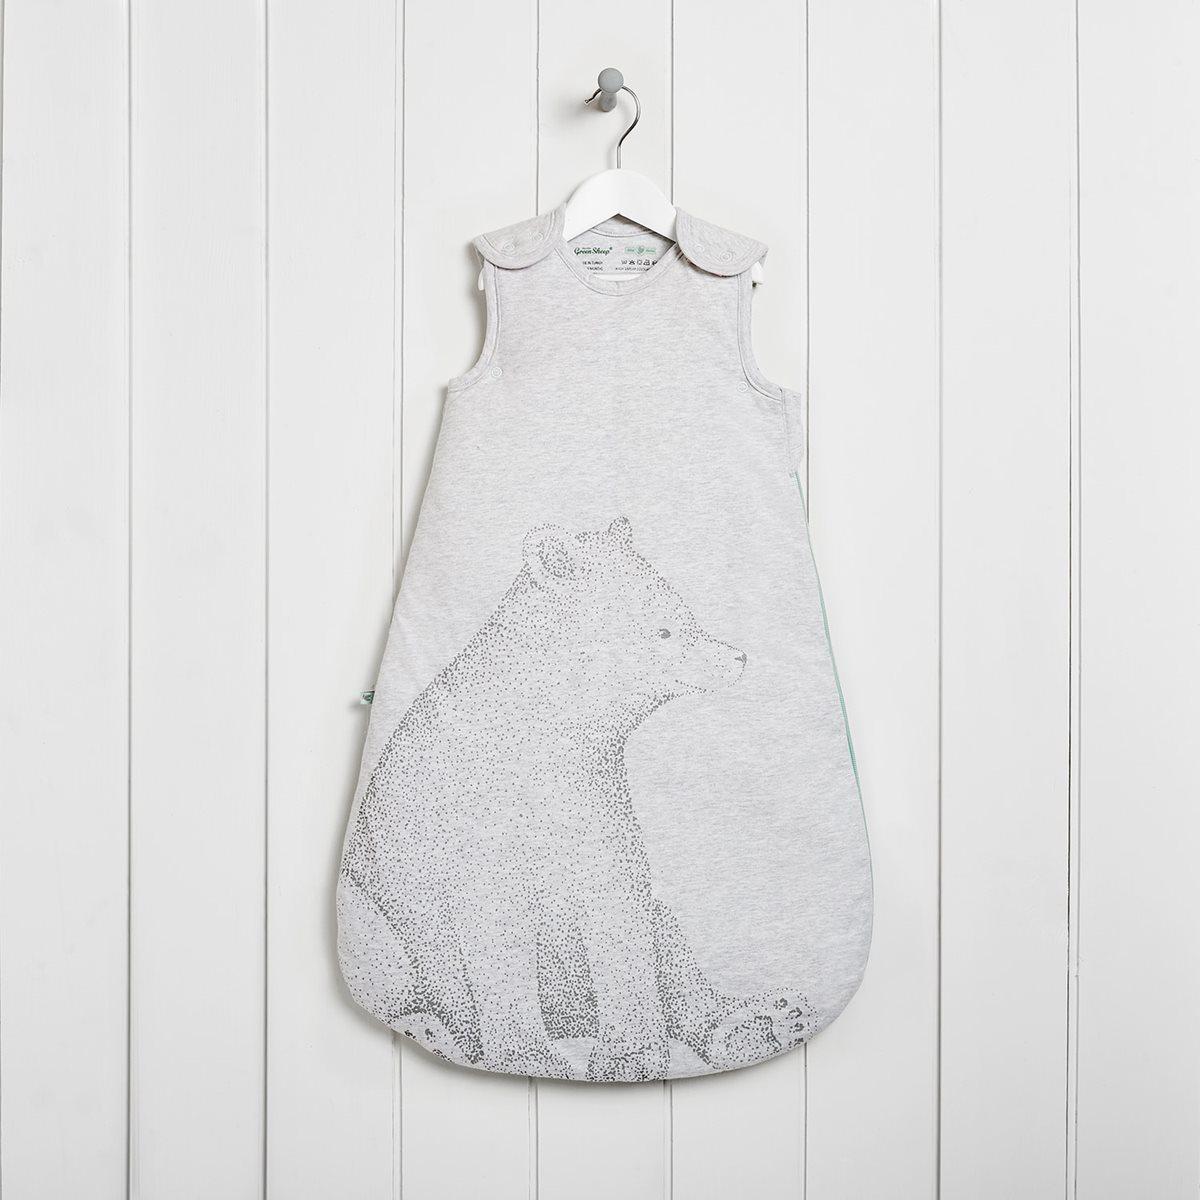 new style 27450 584bb Wild Cotton Organic Sleeping Bag 2.5 Tog - Bear